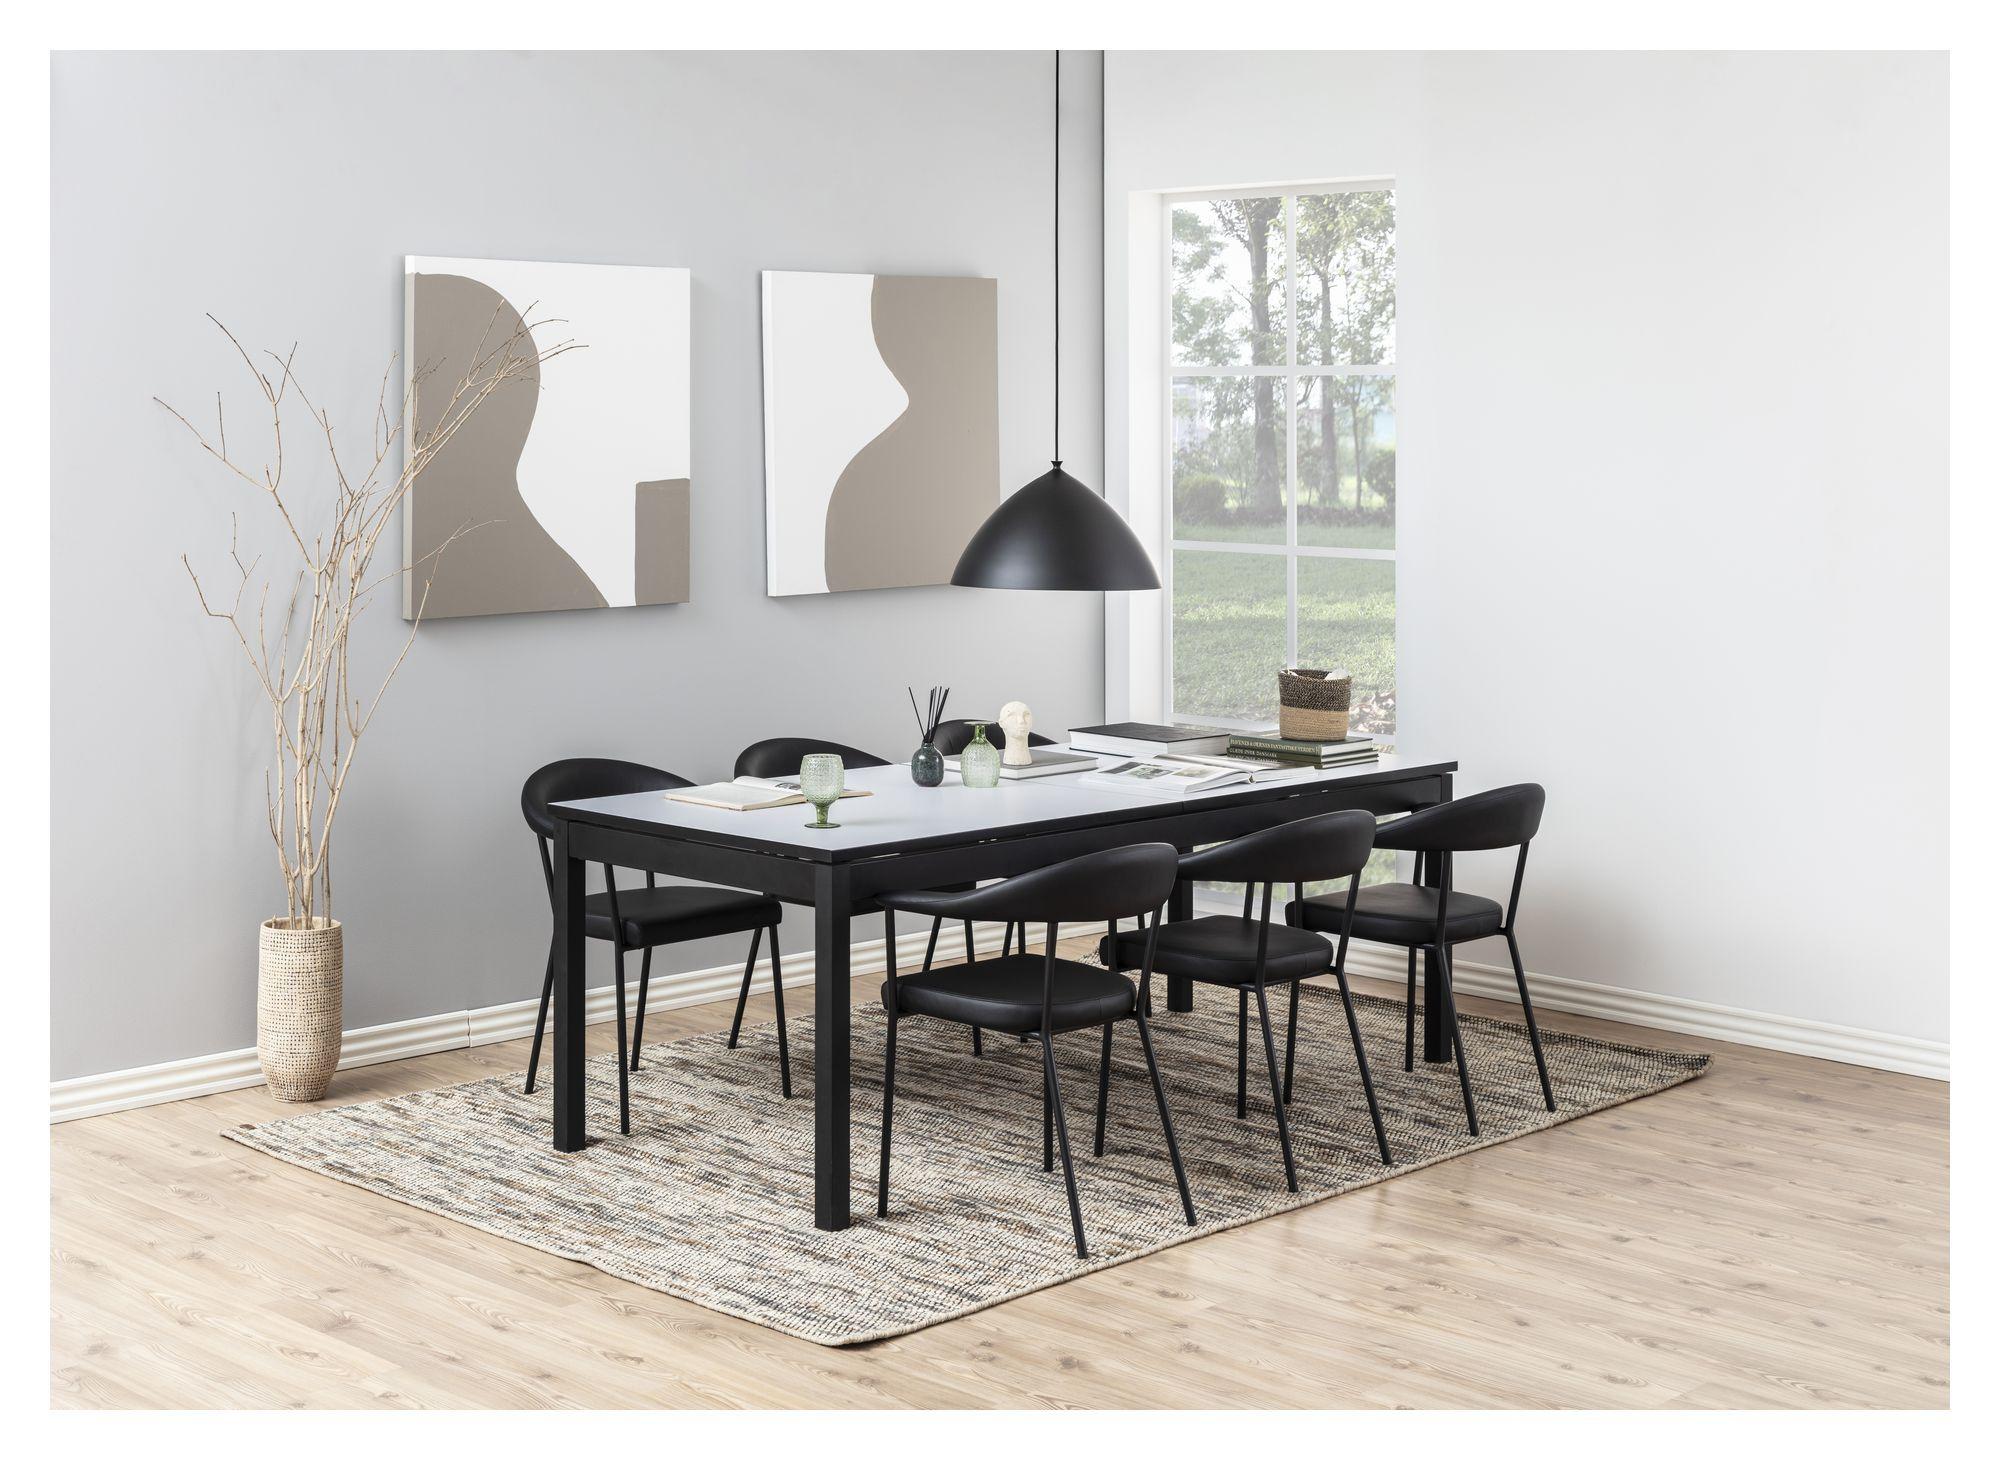 Asli Spisebordsstol m/armlæn - Sort PU